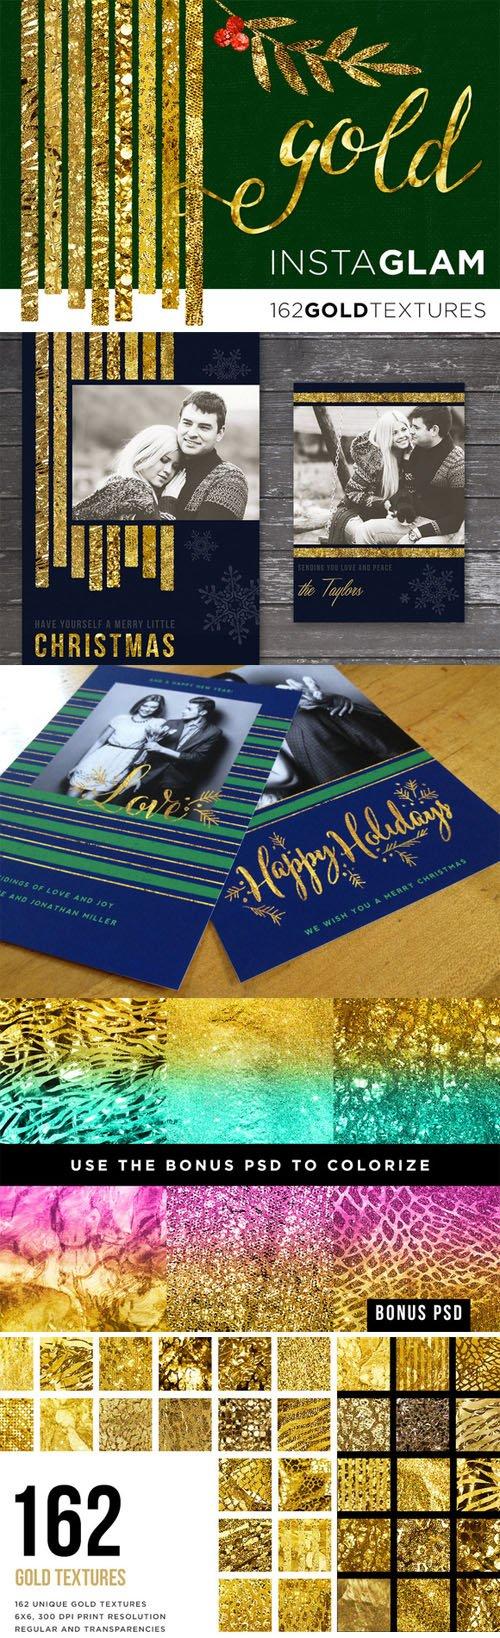 Gold Foil InstaGlam Texture Megapack - Creativemarket 95032